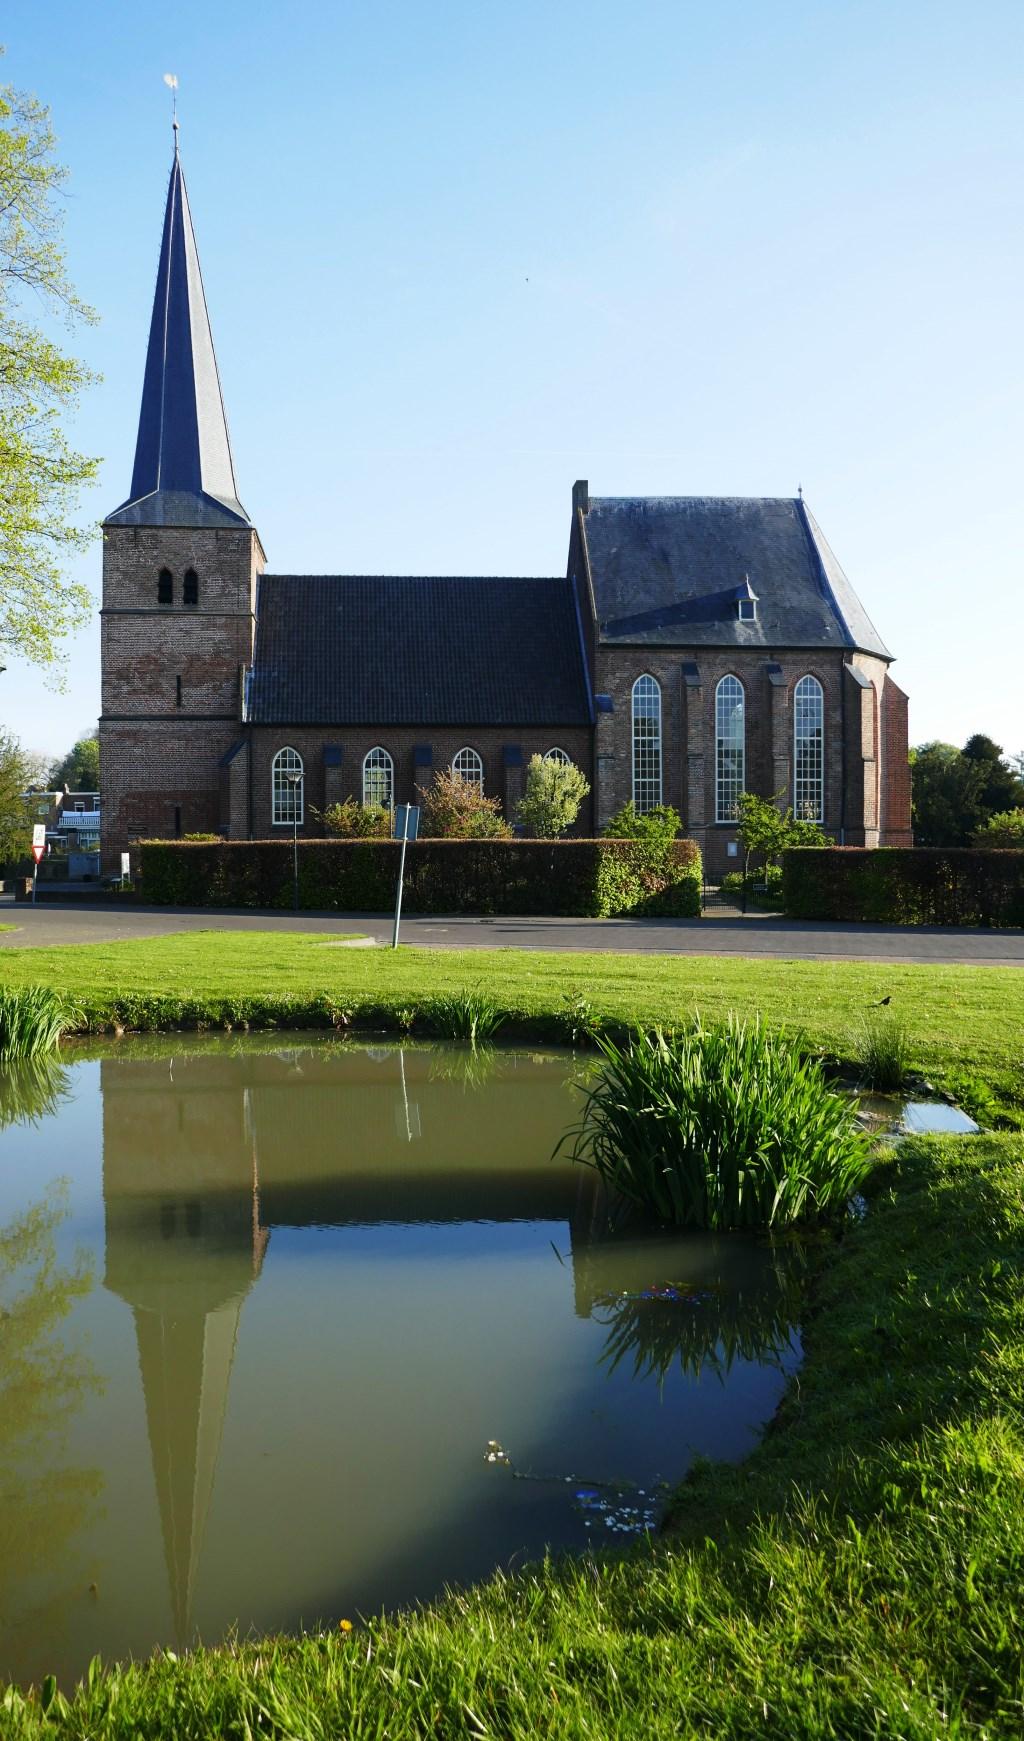 Kerk aan de Groesbeek